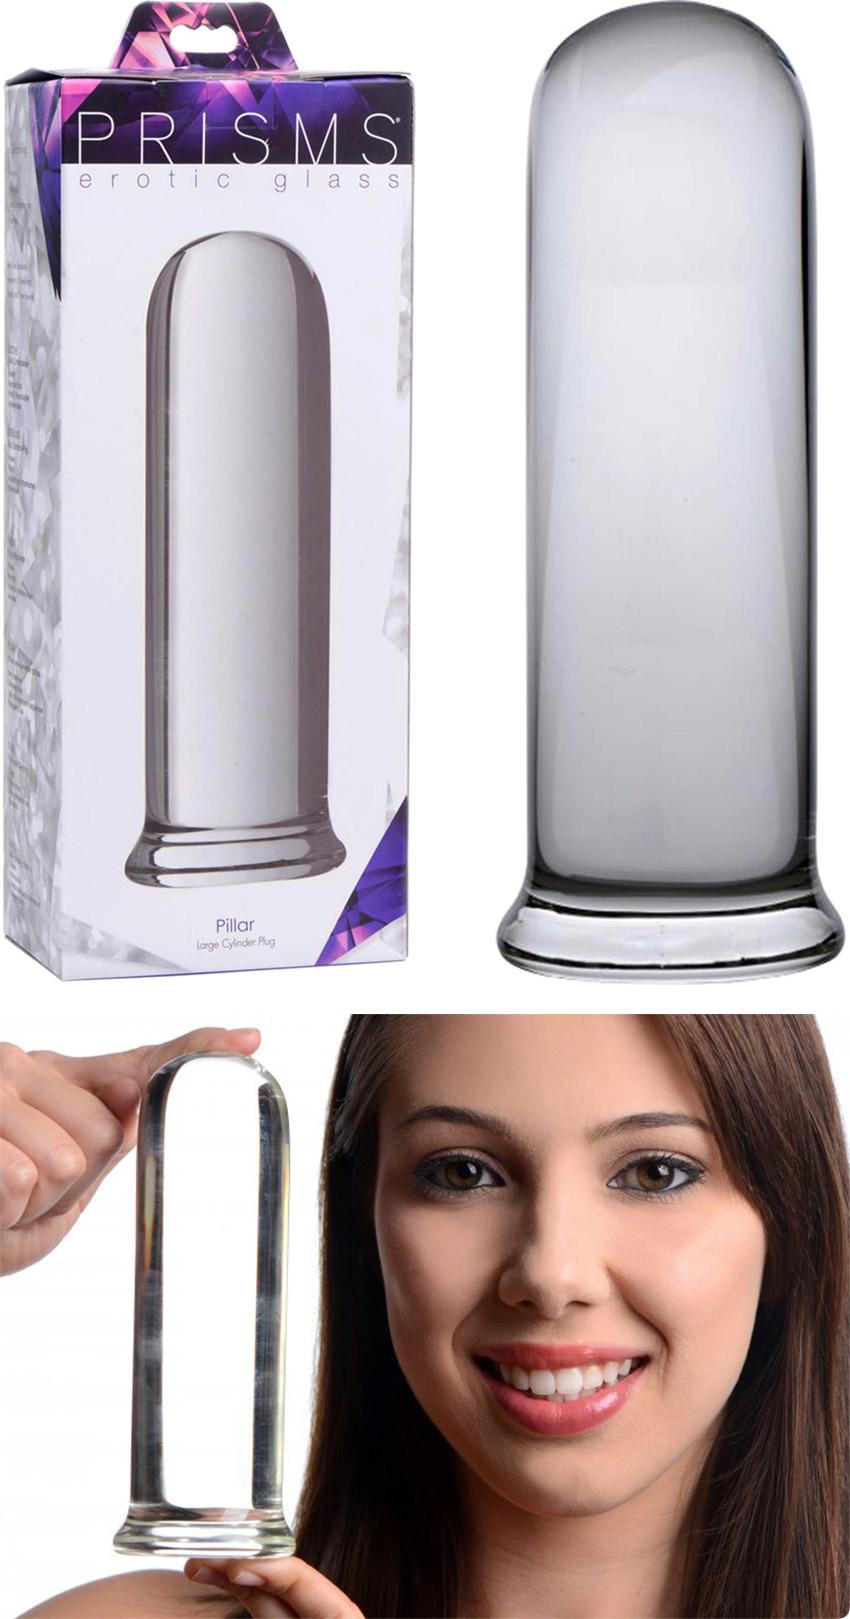 Plug anale di vetro Prisms Pillar - Trasparente